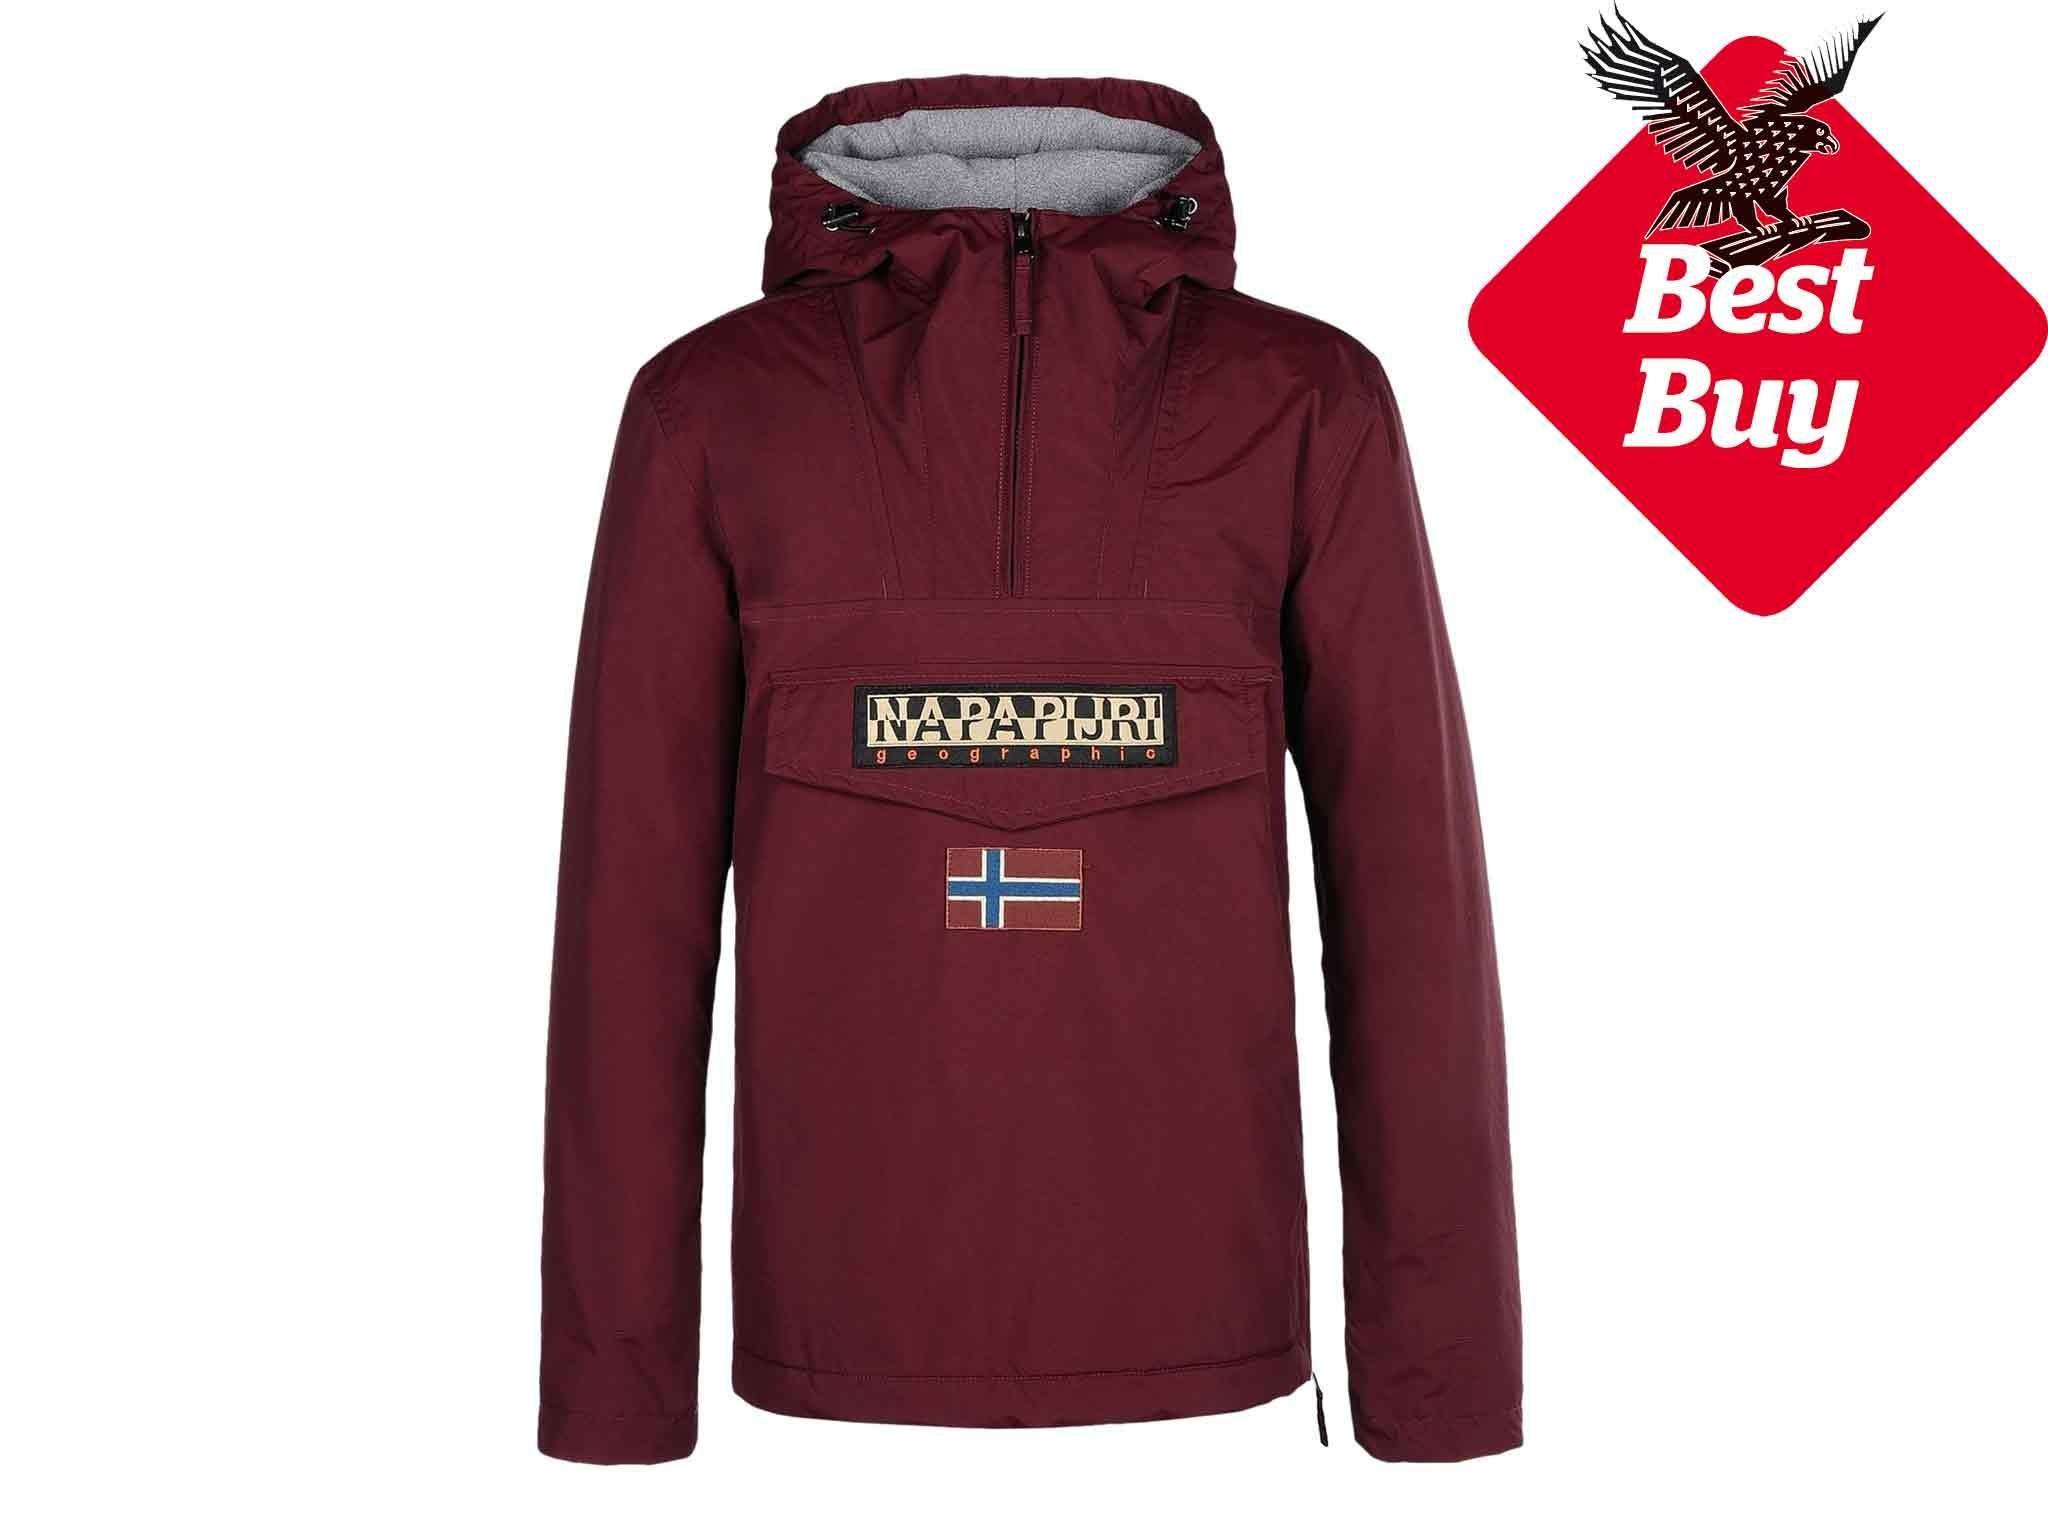 94660b014 9 best men's autumn jackets | The Independent